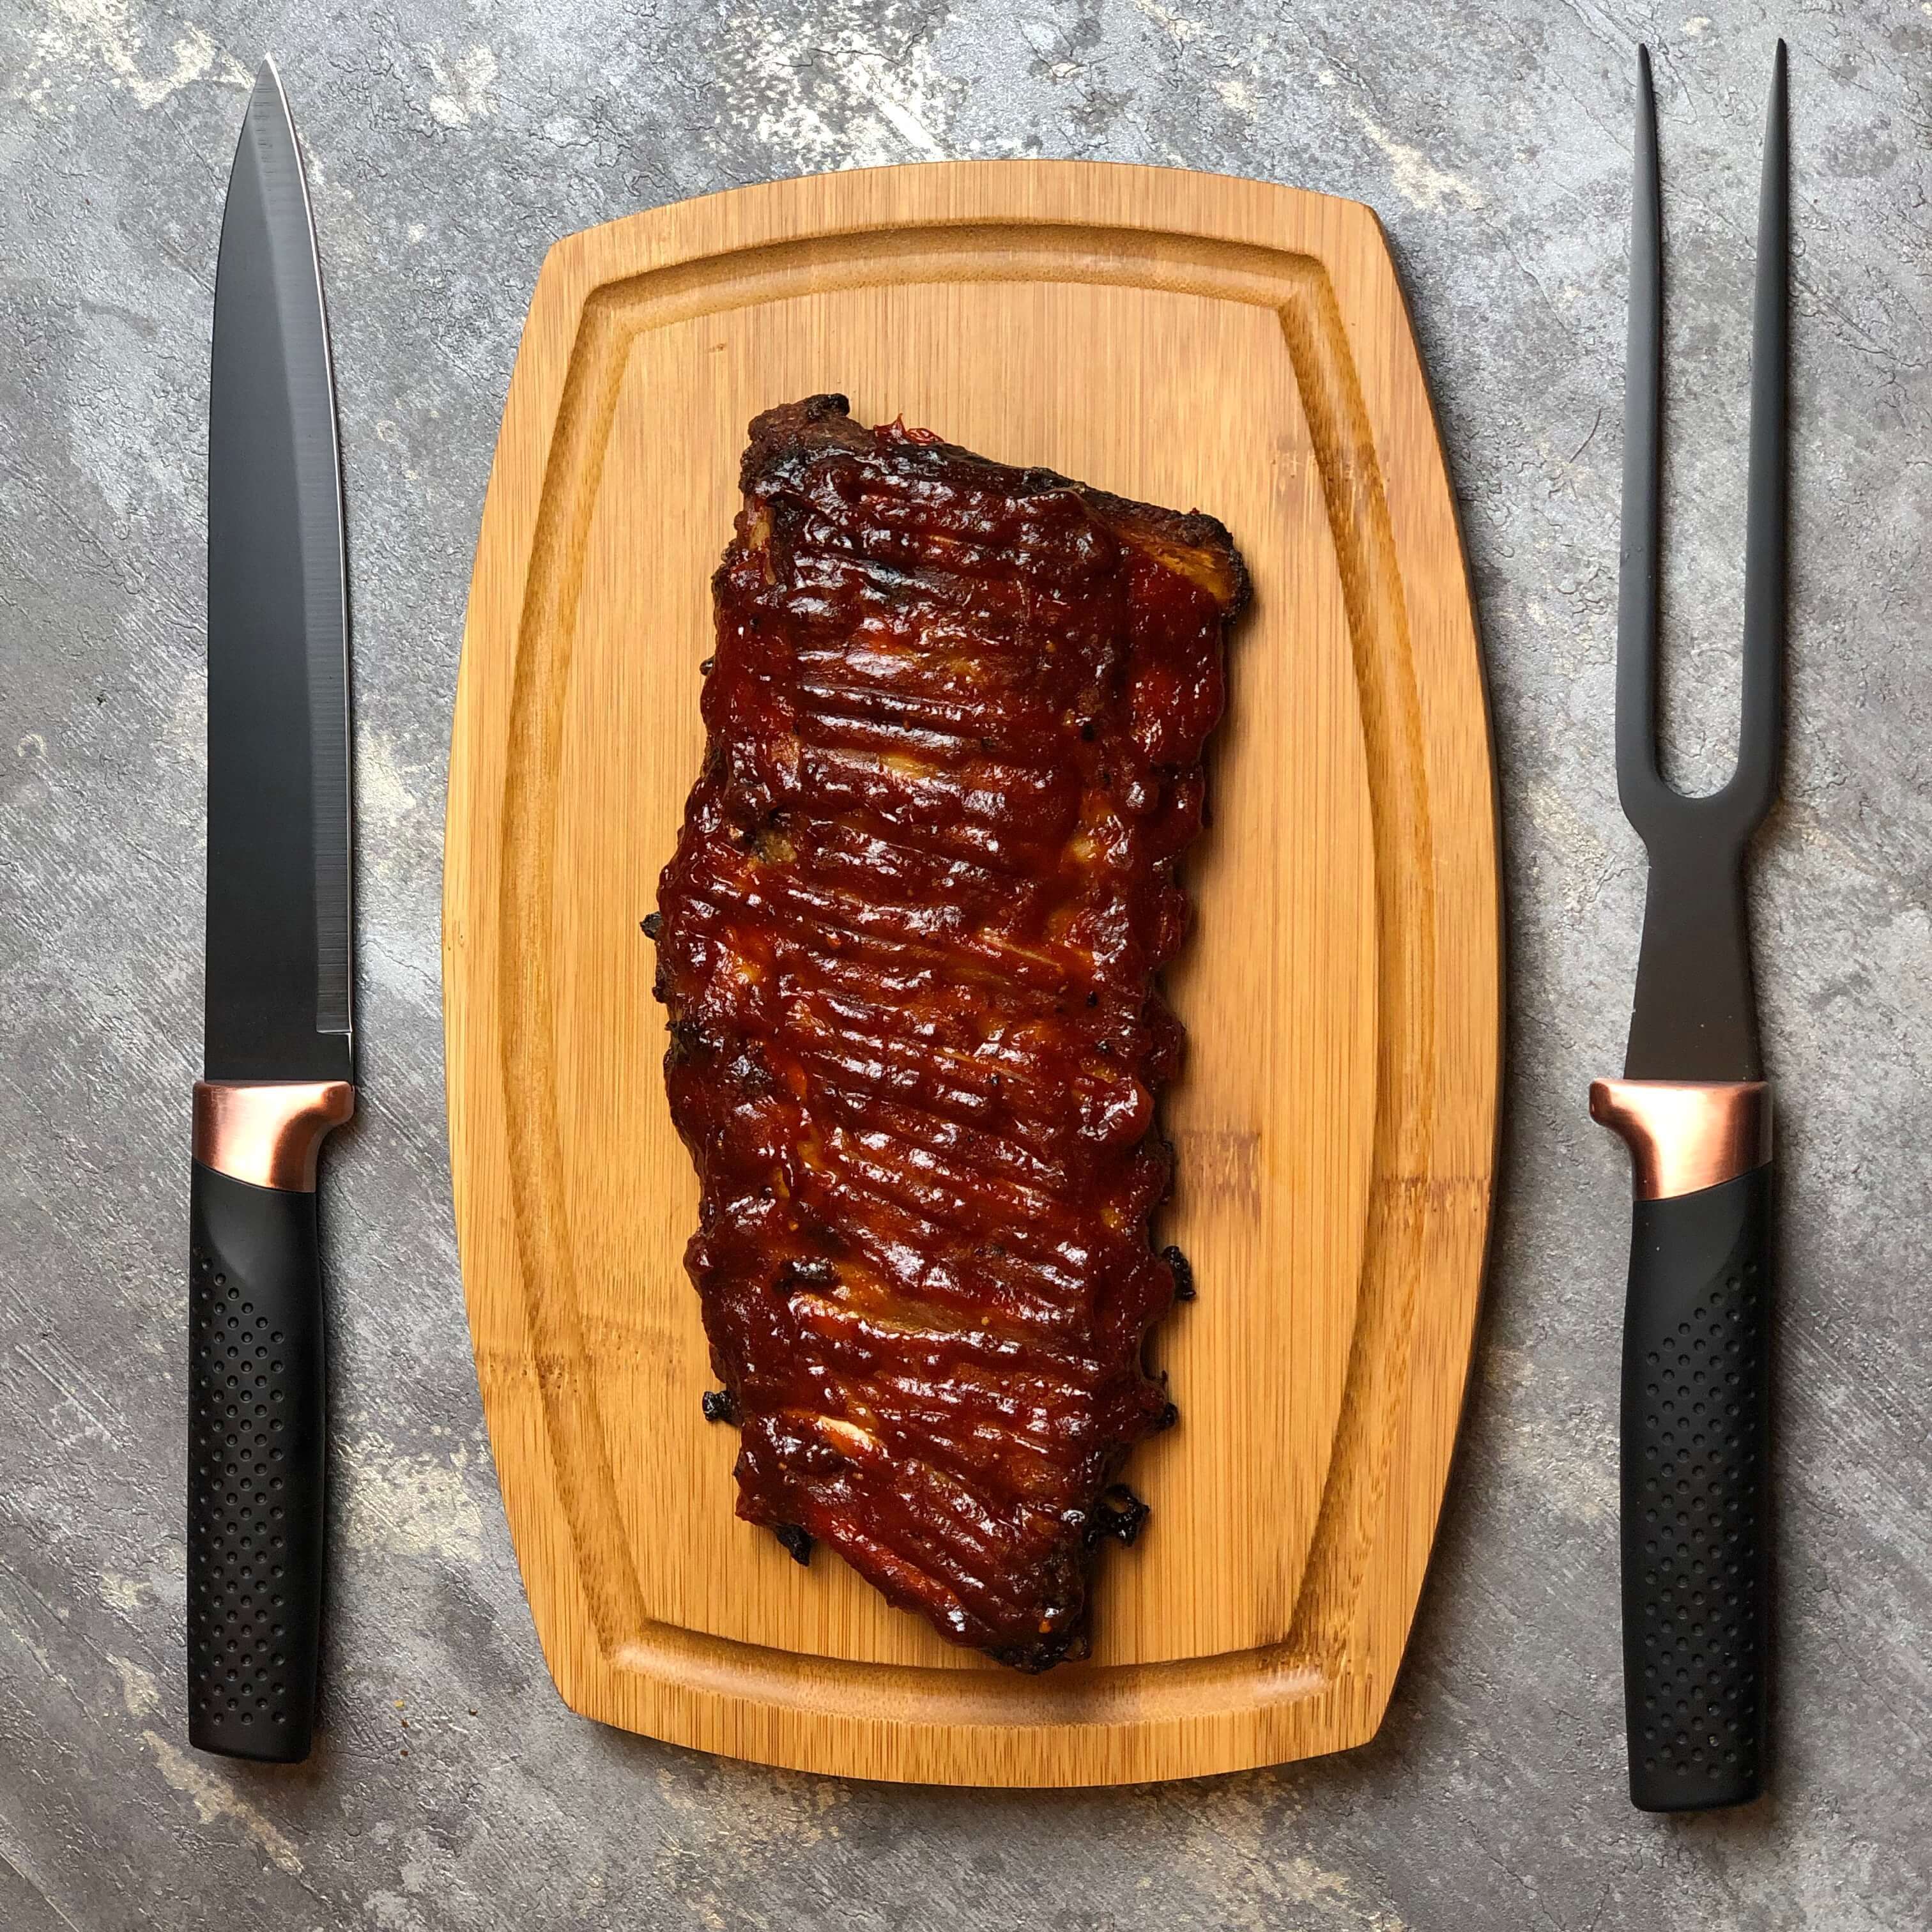 Nates jack daniels bbq rack of ribs recipe nates food nates jack daniels bbq rack of ribs recipe forumfinder Images